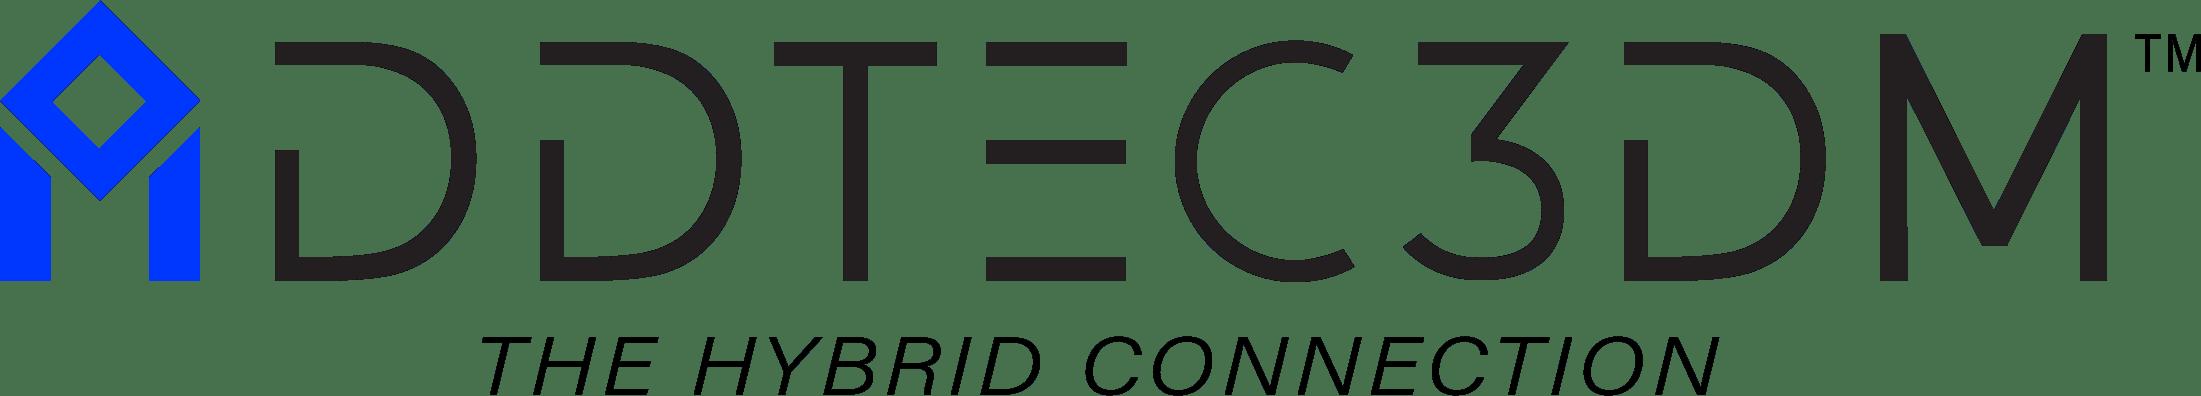 ADDTEC 3DM Logo